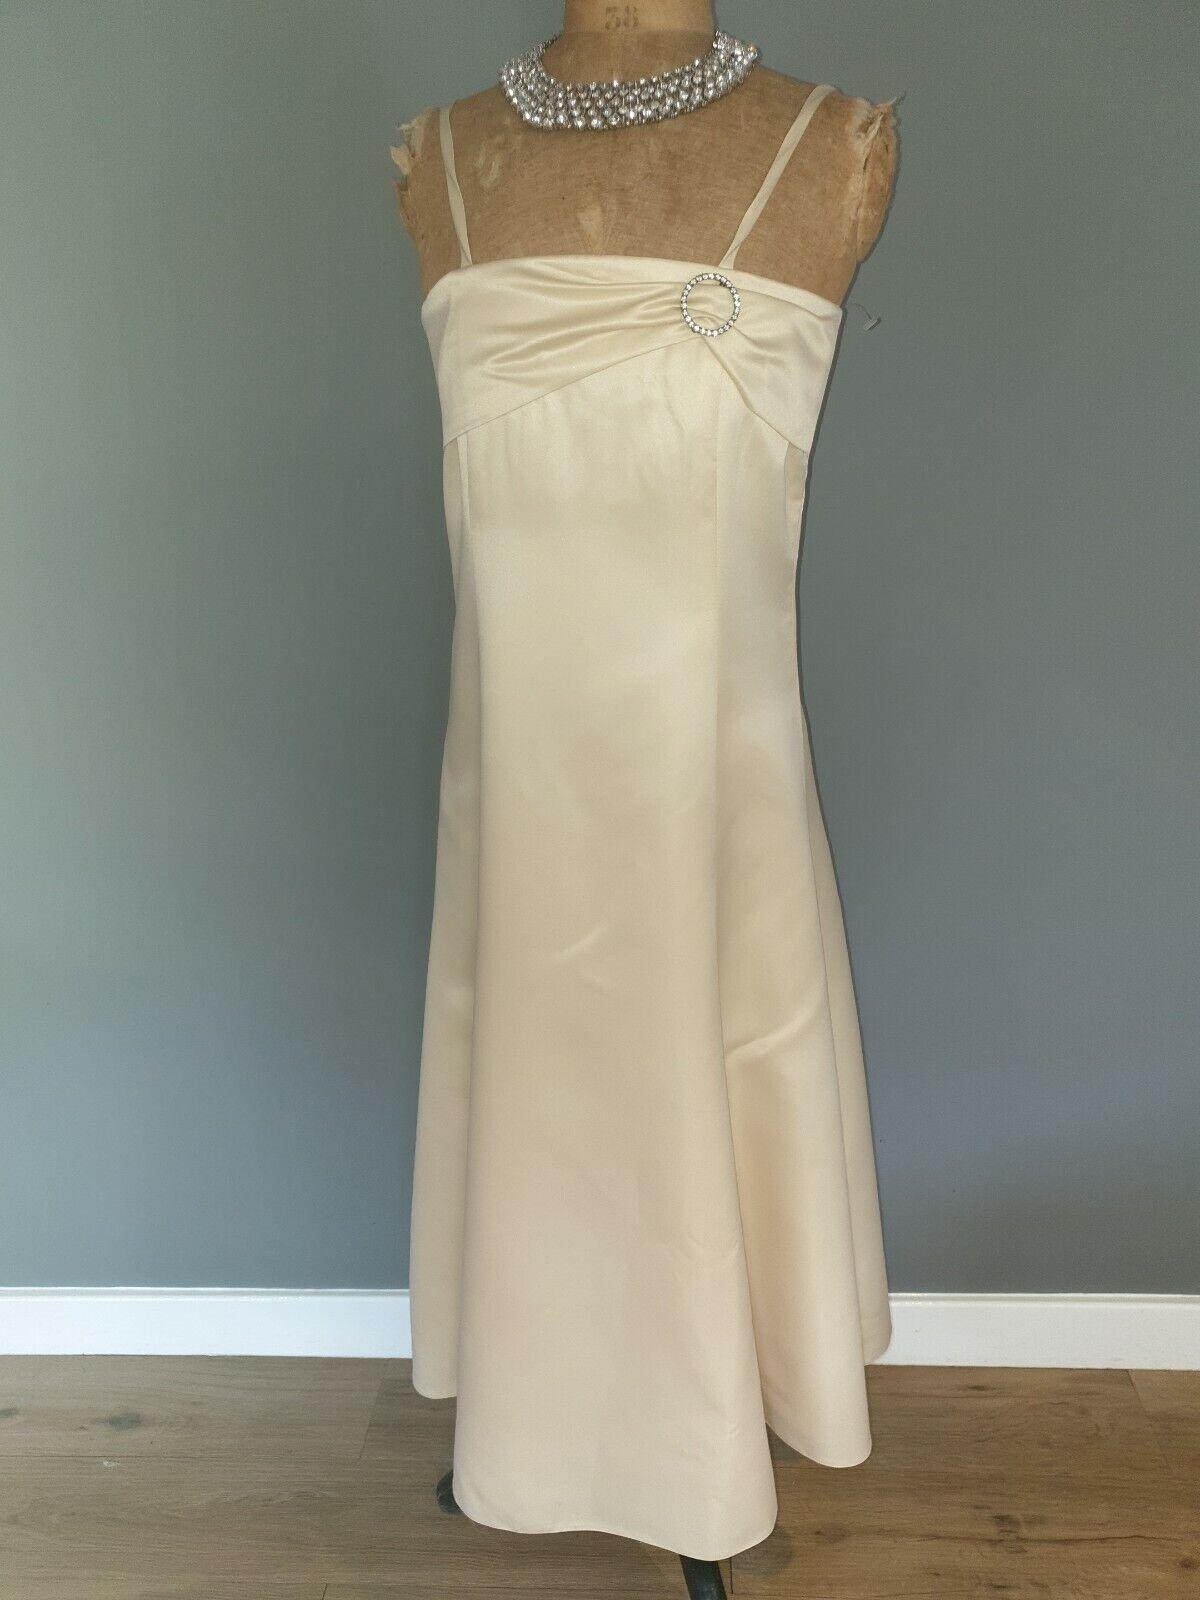 New Designer Handmade Long Occasion Dress Age 10 140 cm Bridesmaid/party